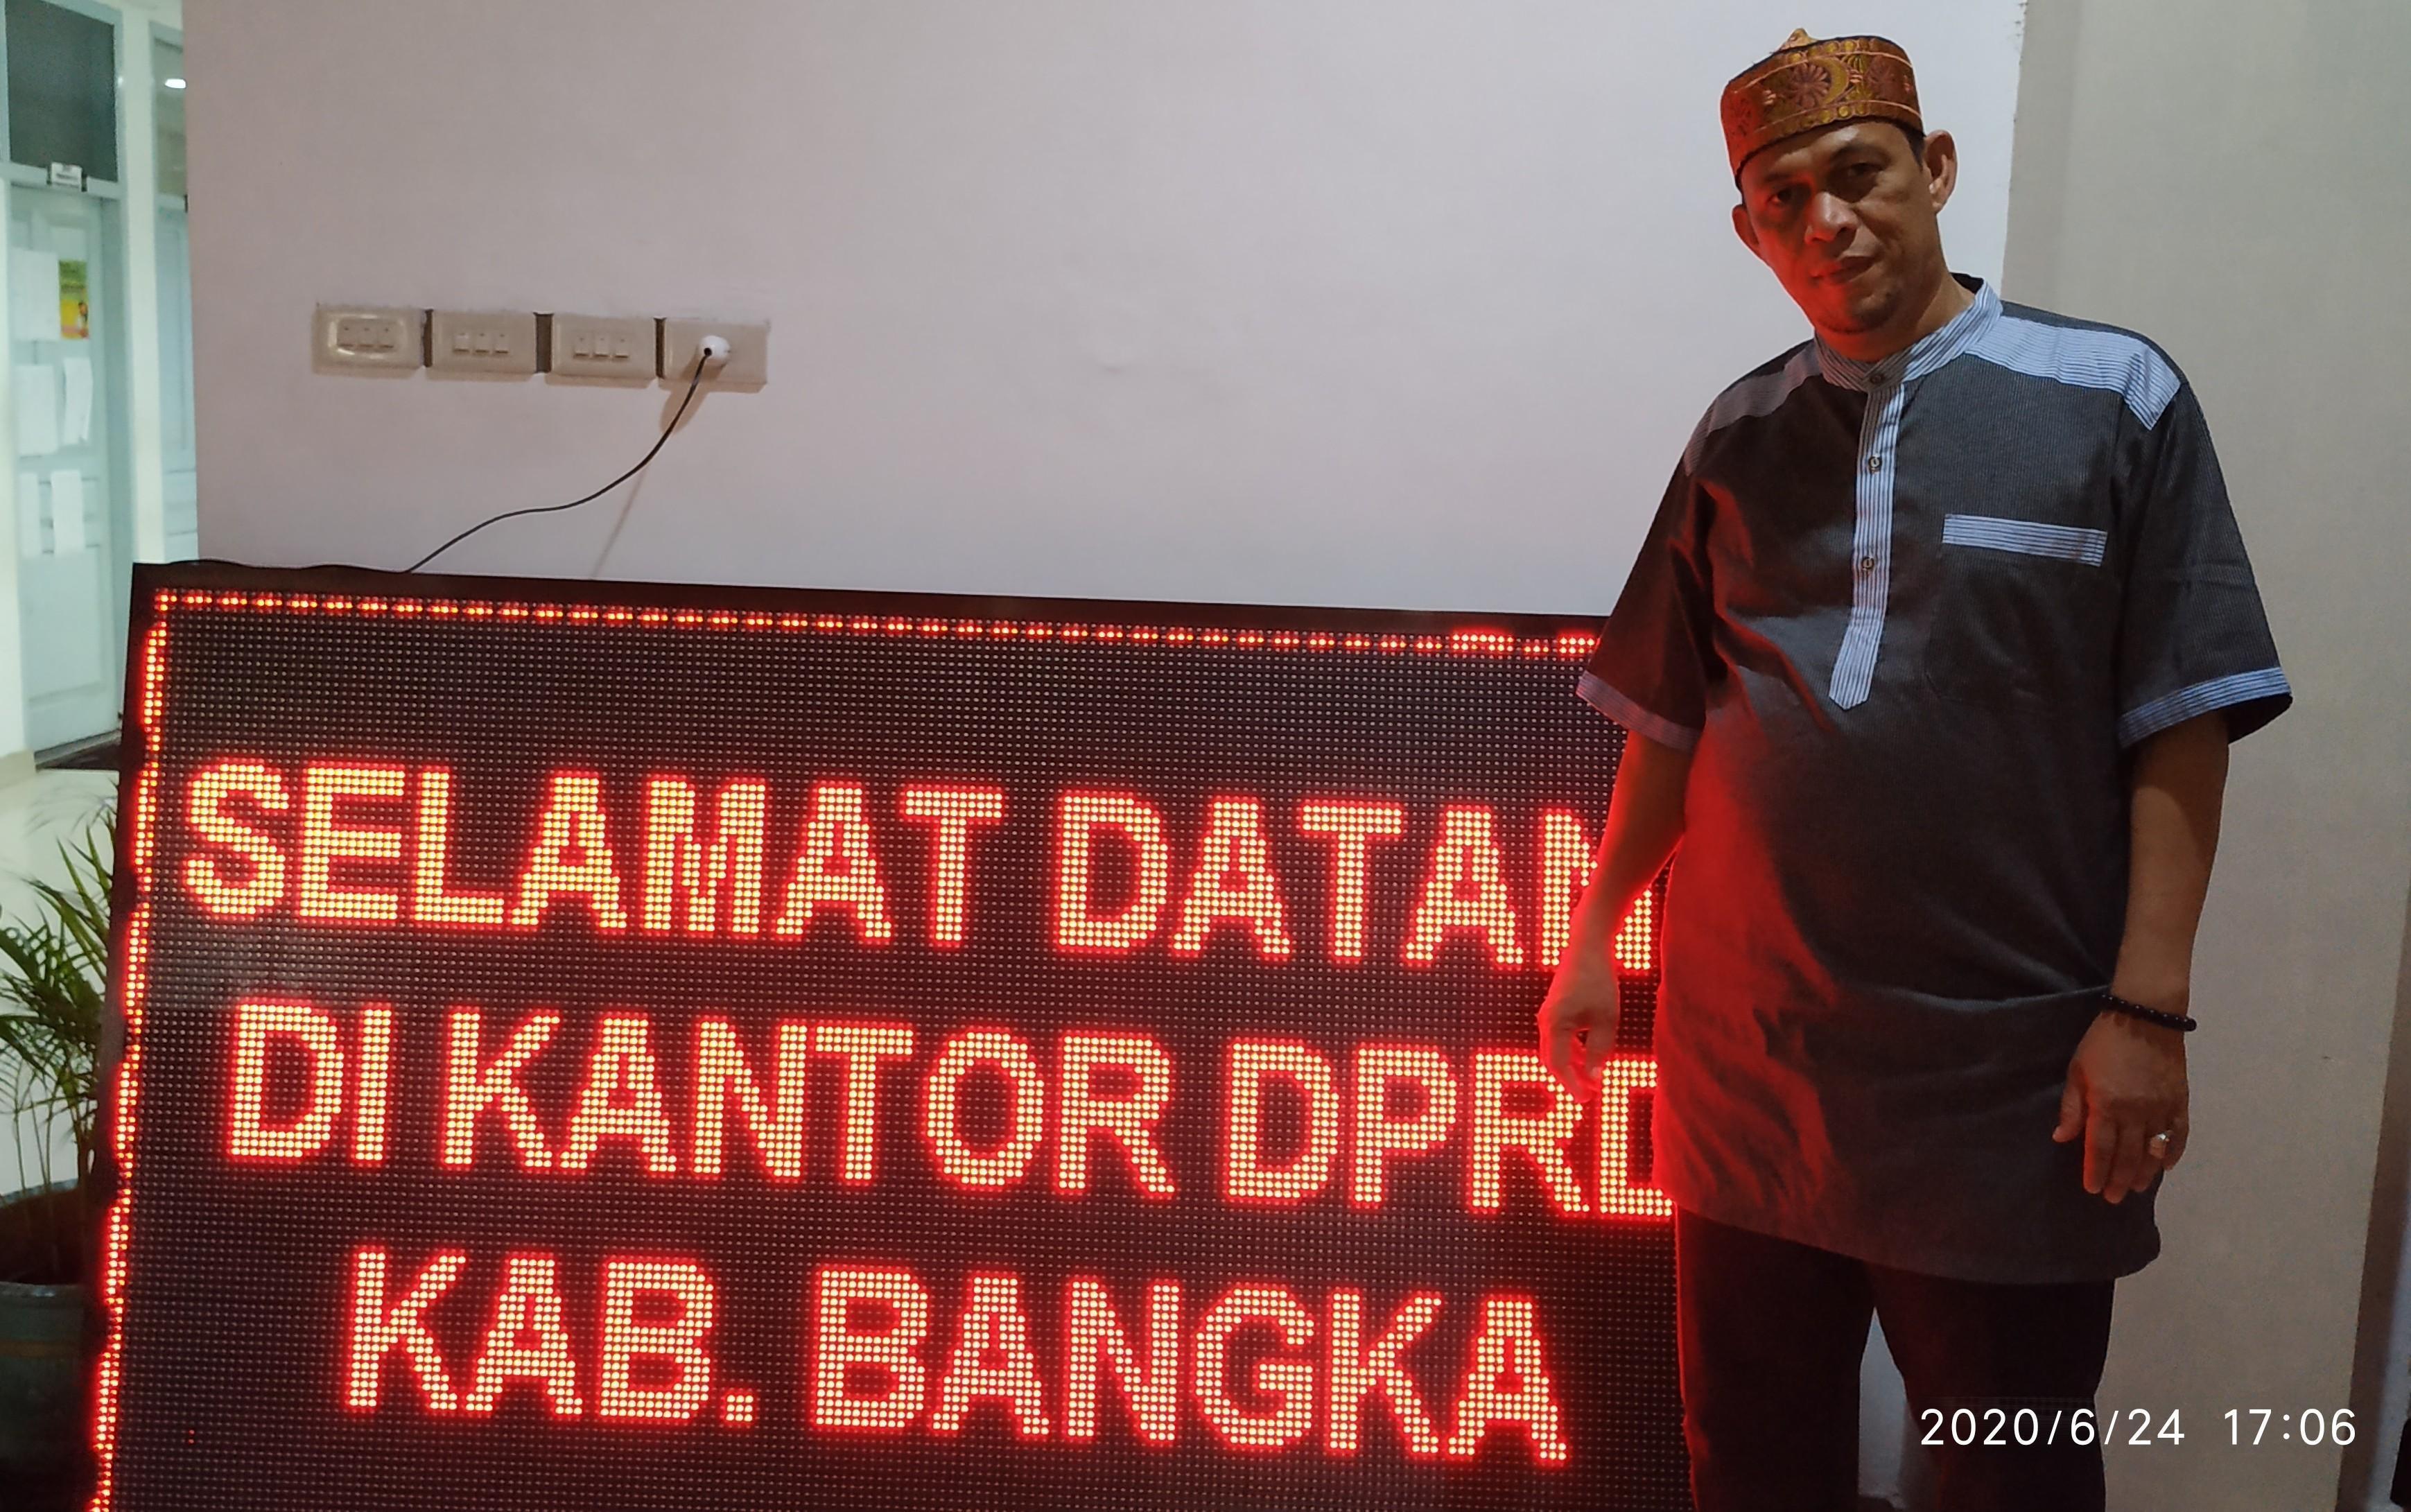 Kasubag Humas dan Protokol DPRD Bangka Fungsikan Running Text Sebagai Sumber Informasi